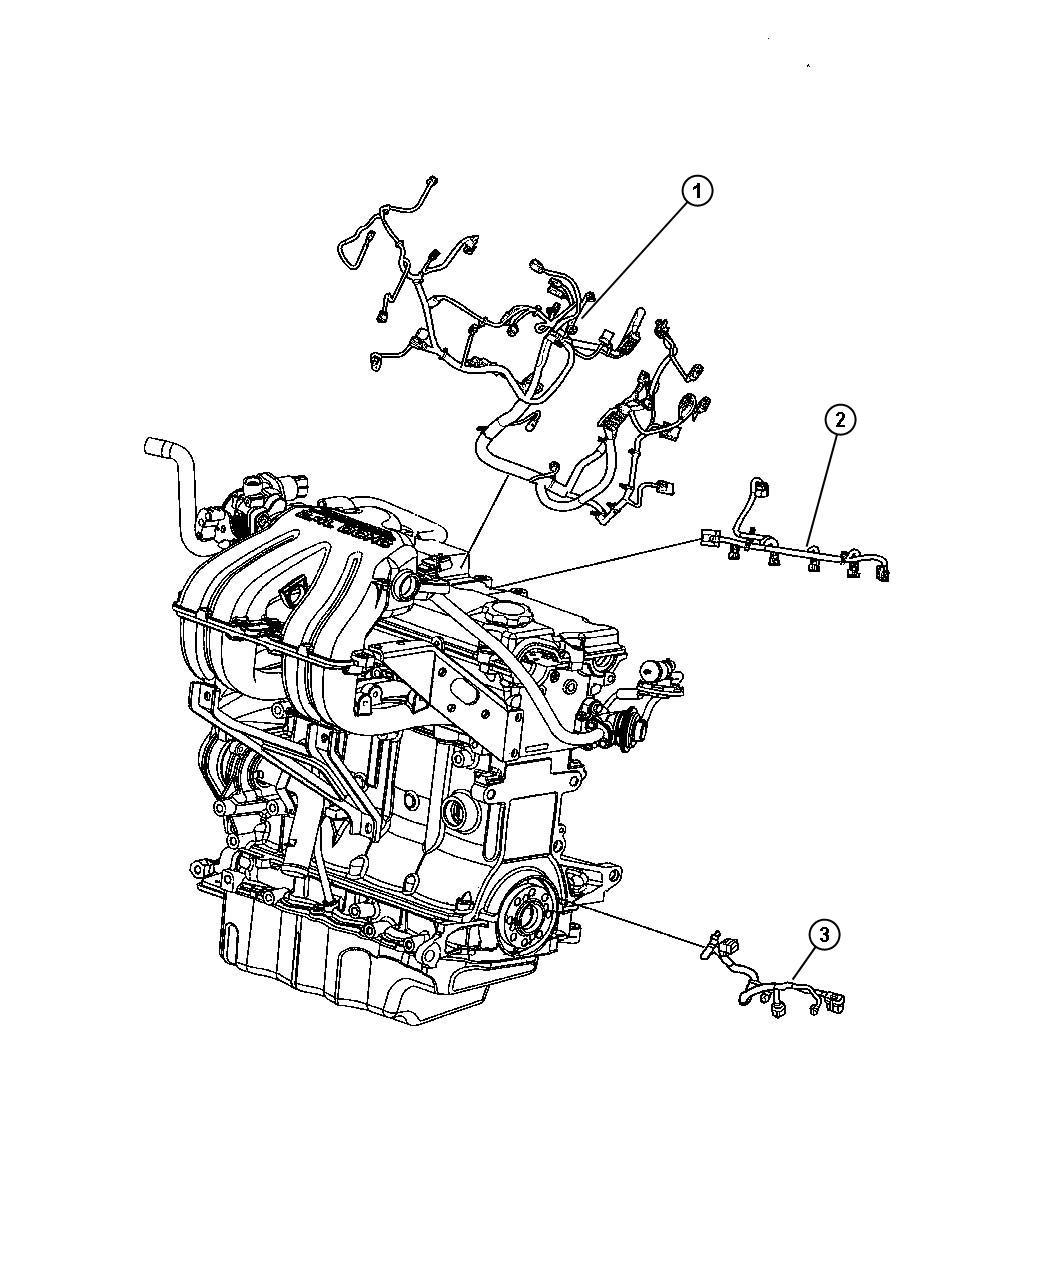 2011 Dodge NITRO Wiring. Transmission jumper. Engine